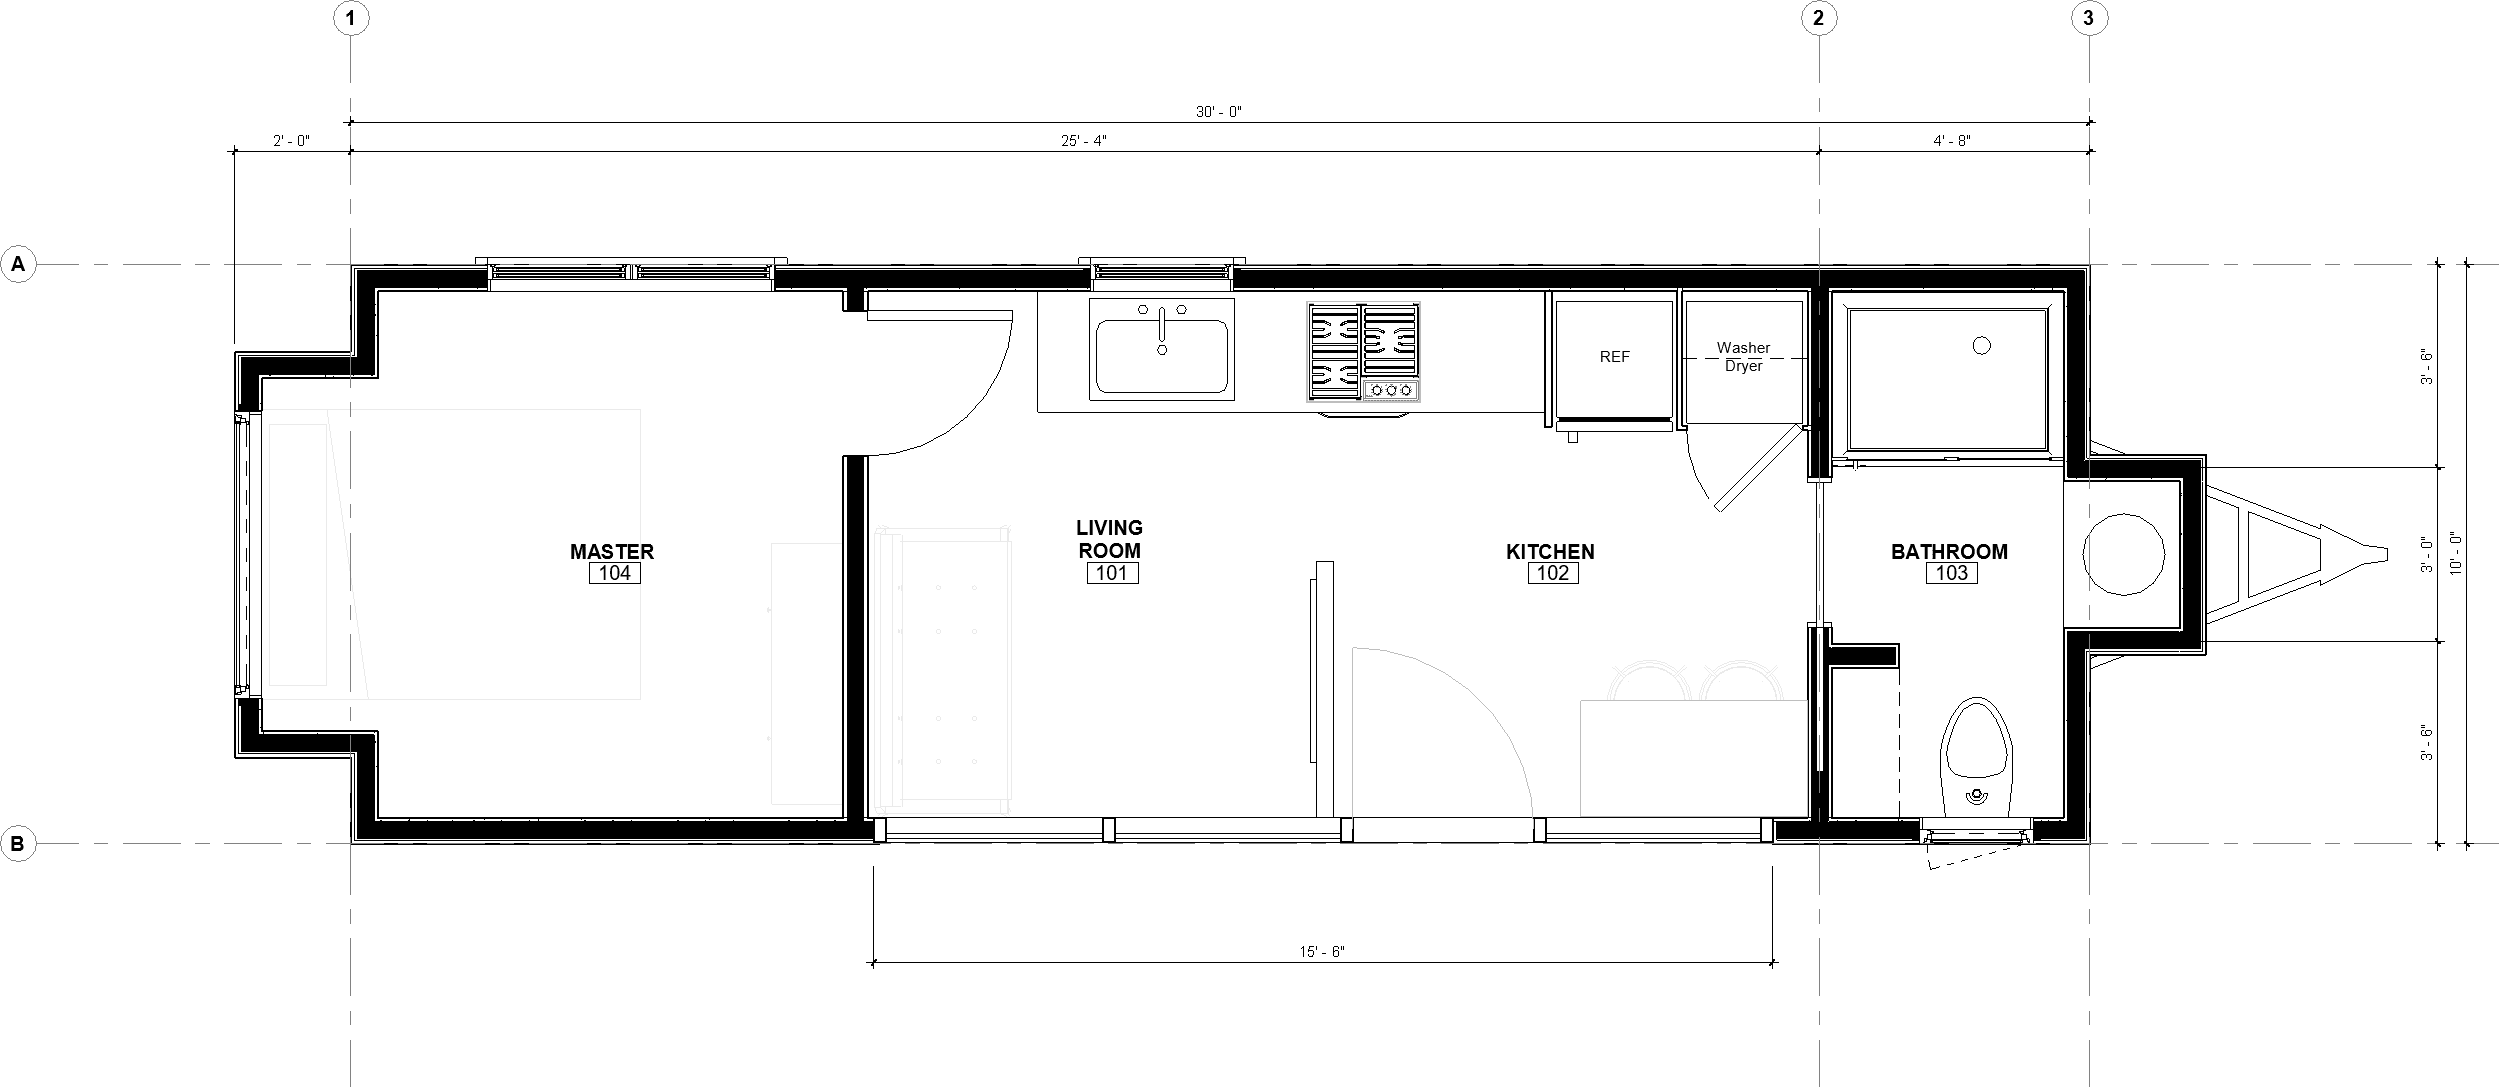 30ft Master on Main Etowah floorplan with dimensions